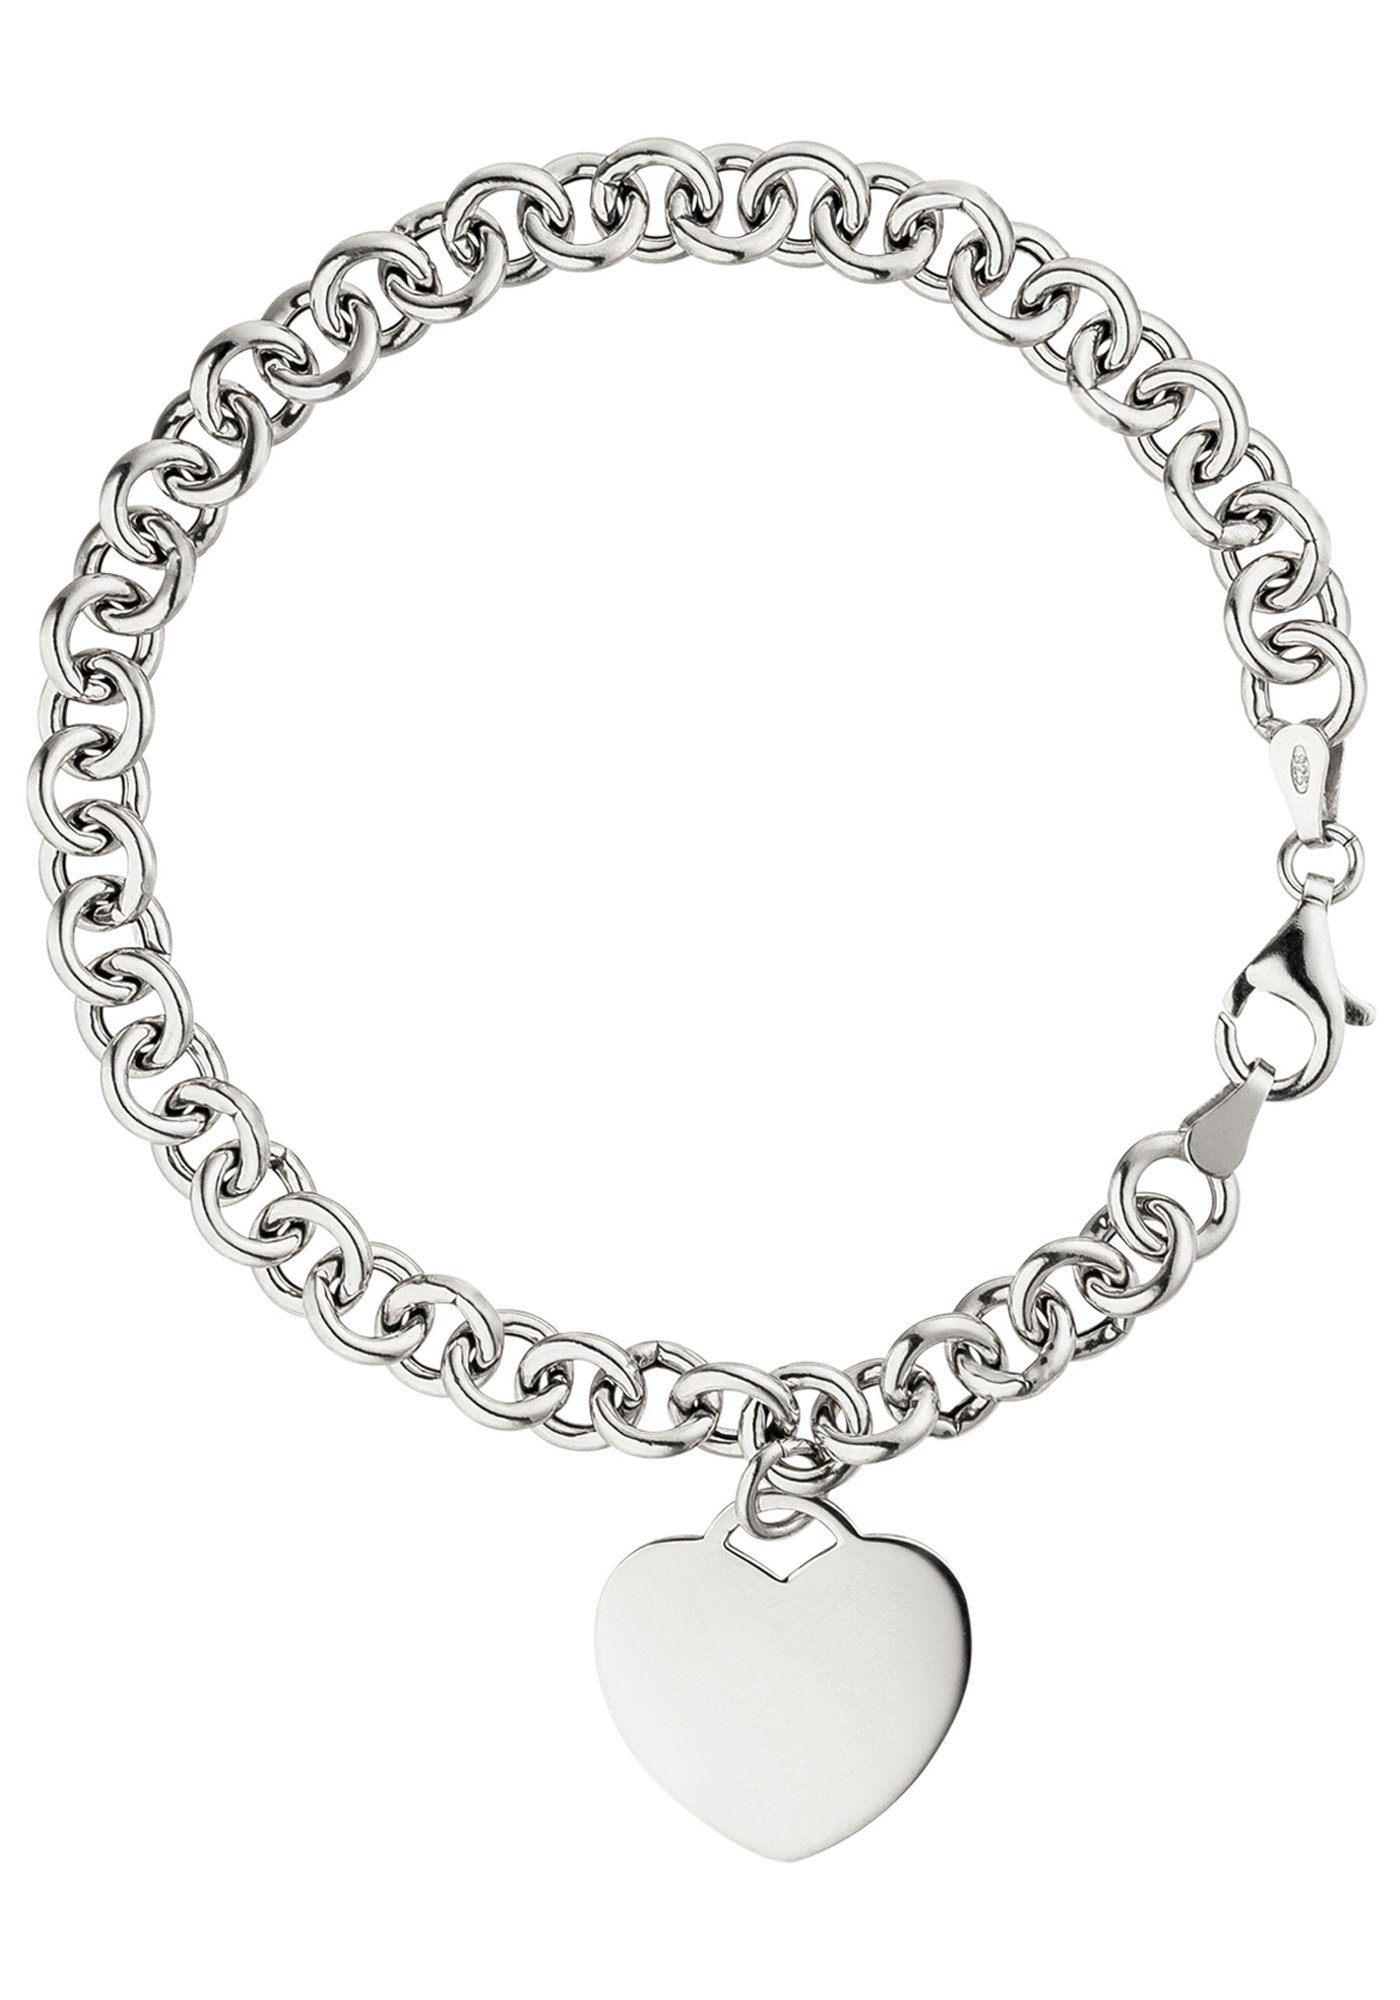 JOBO Silberarmband »Herz« 925 Silber 19 cm